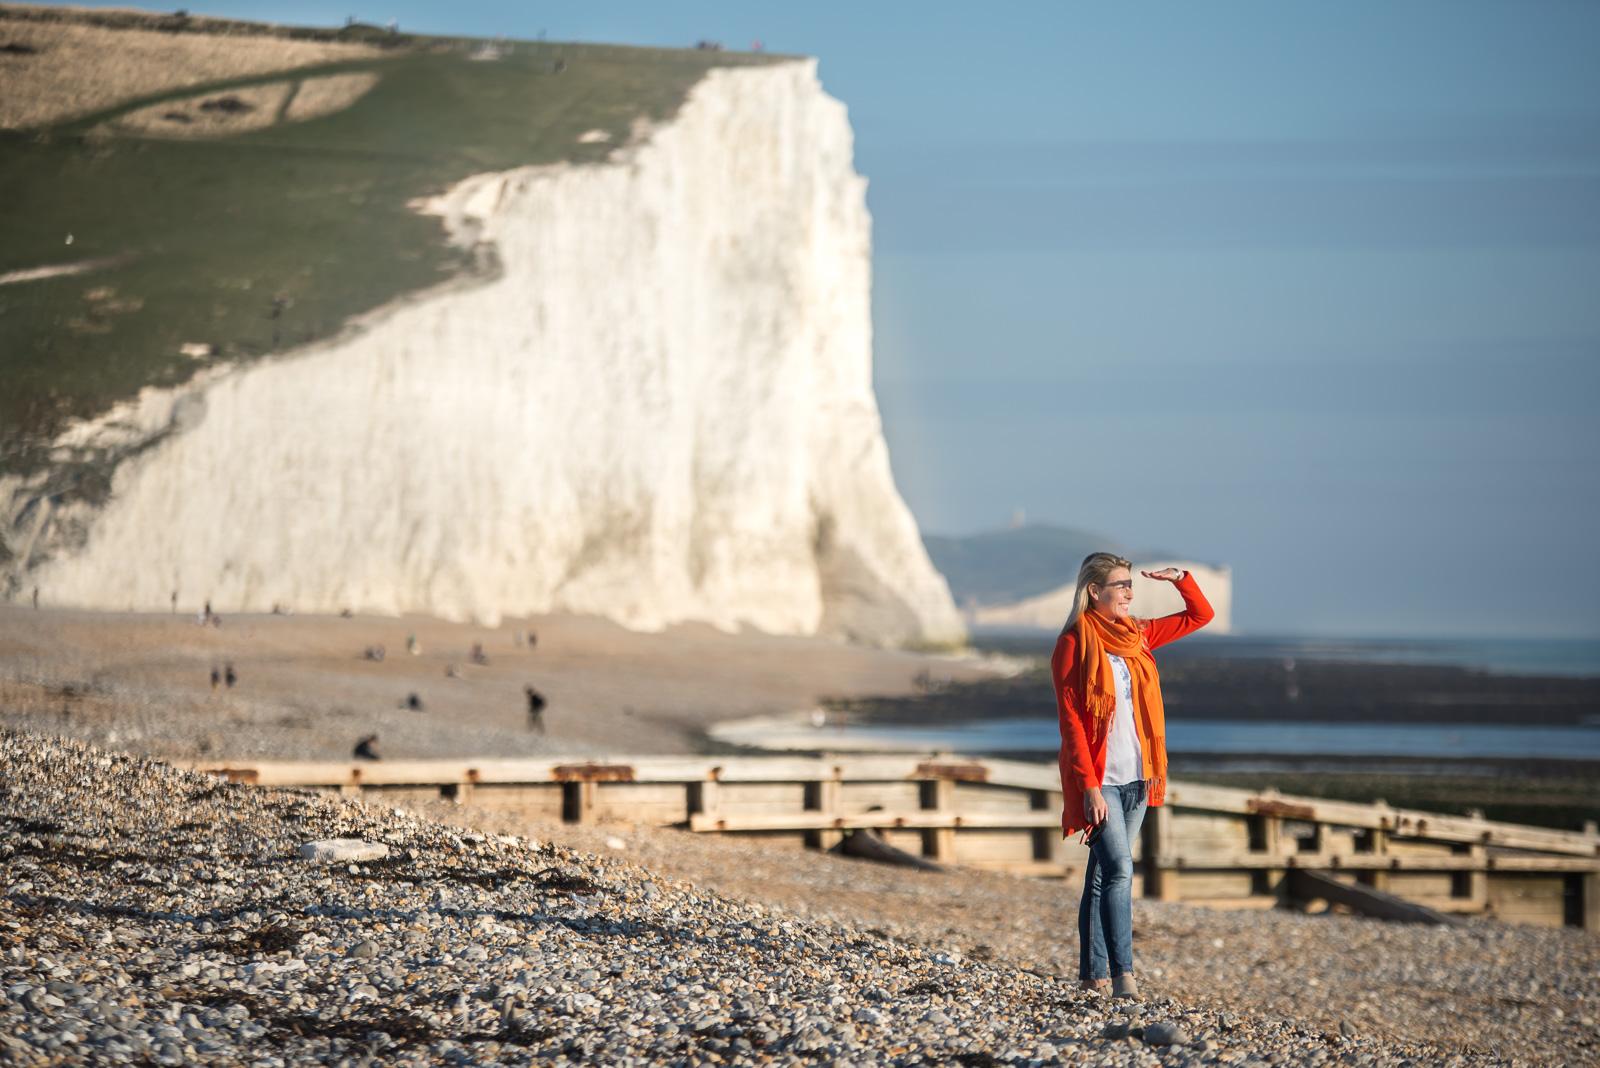 London Brighton Sussex Professional Branding Portrait Photographer - Magdalena Smolarska Photography and Videography